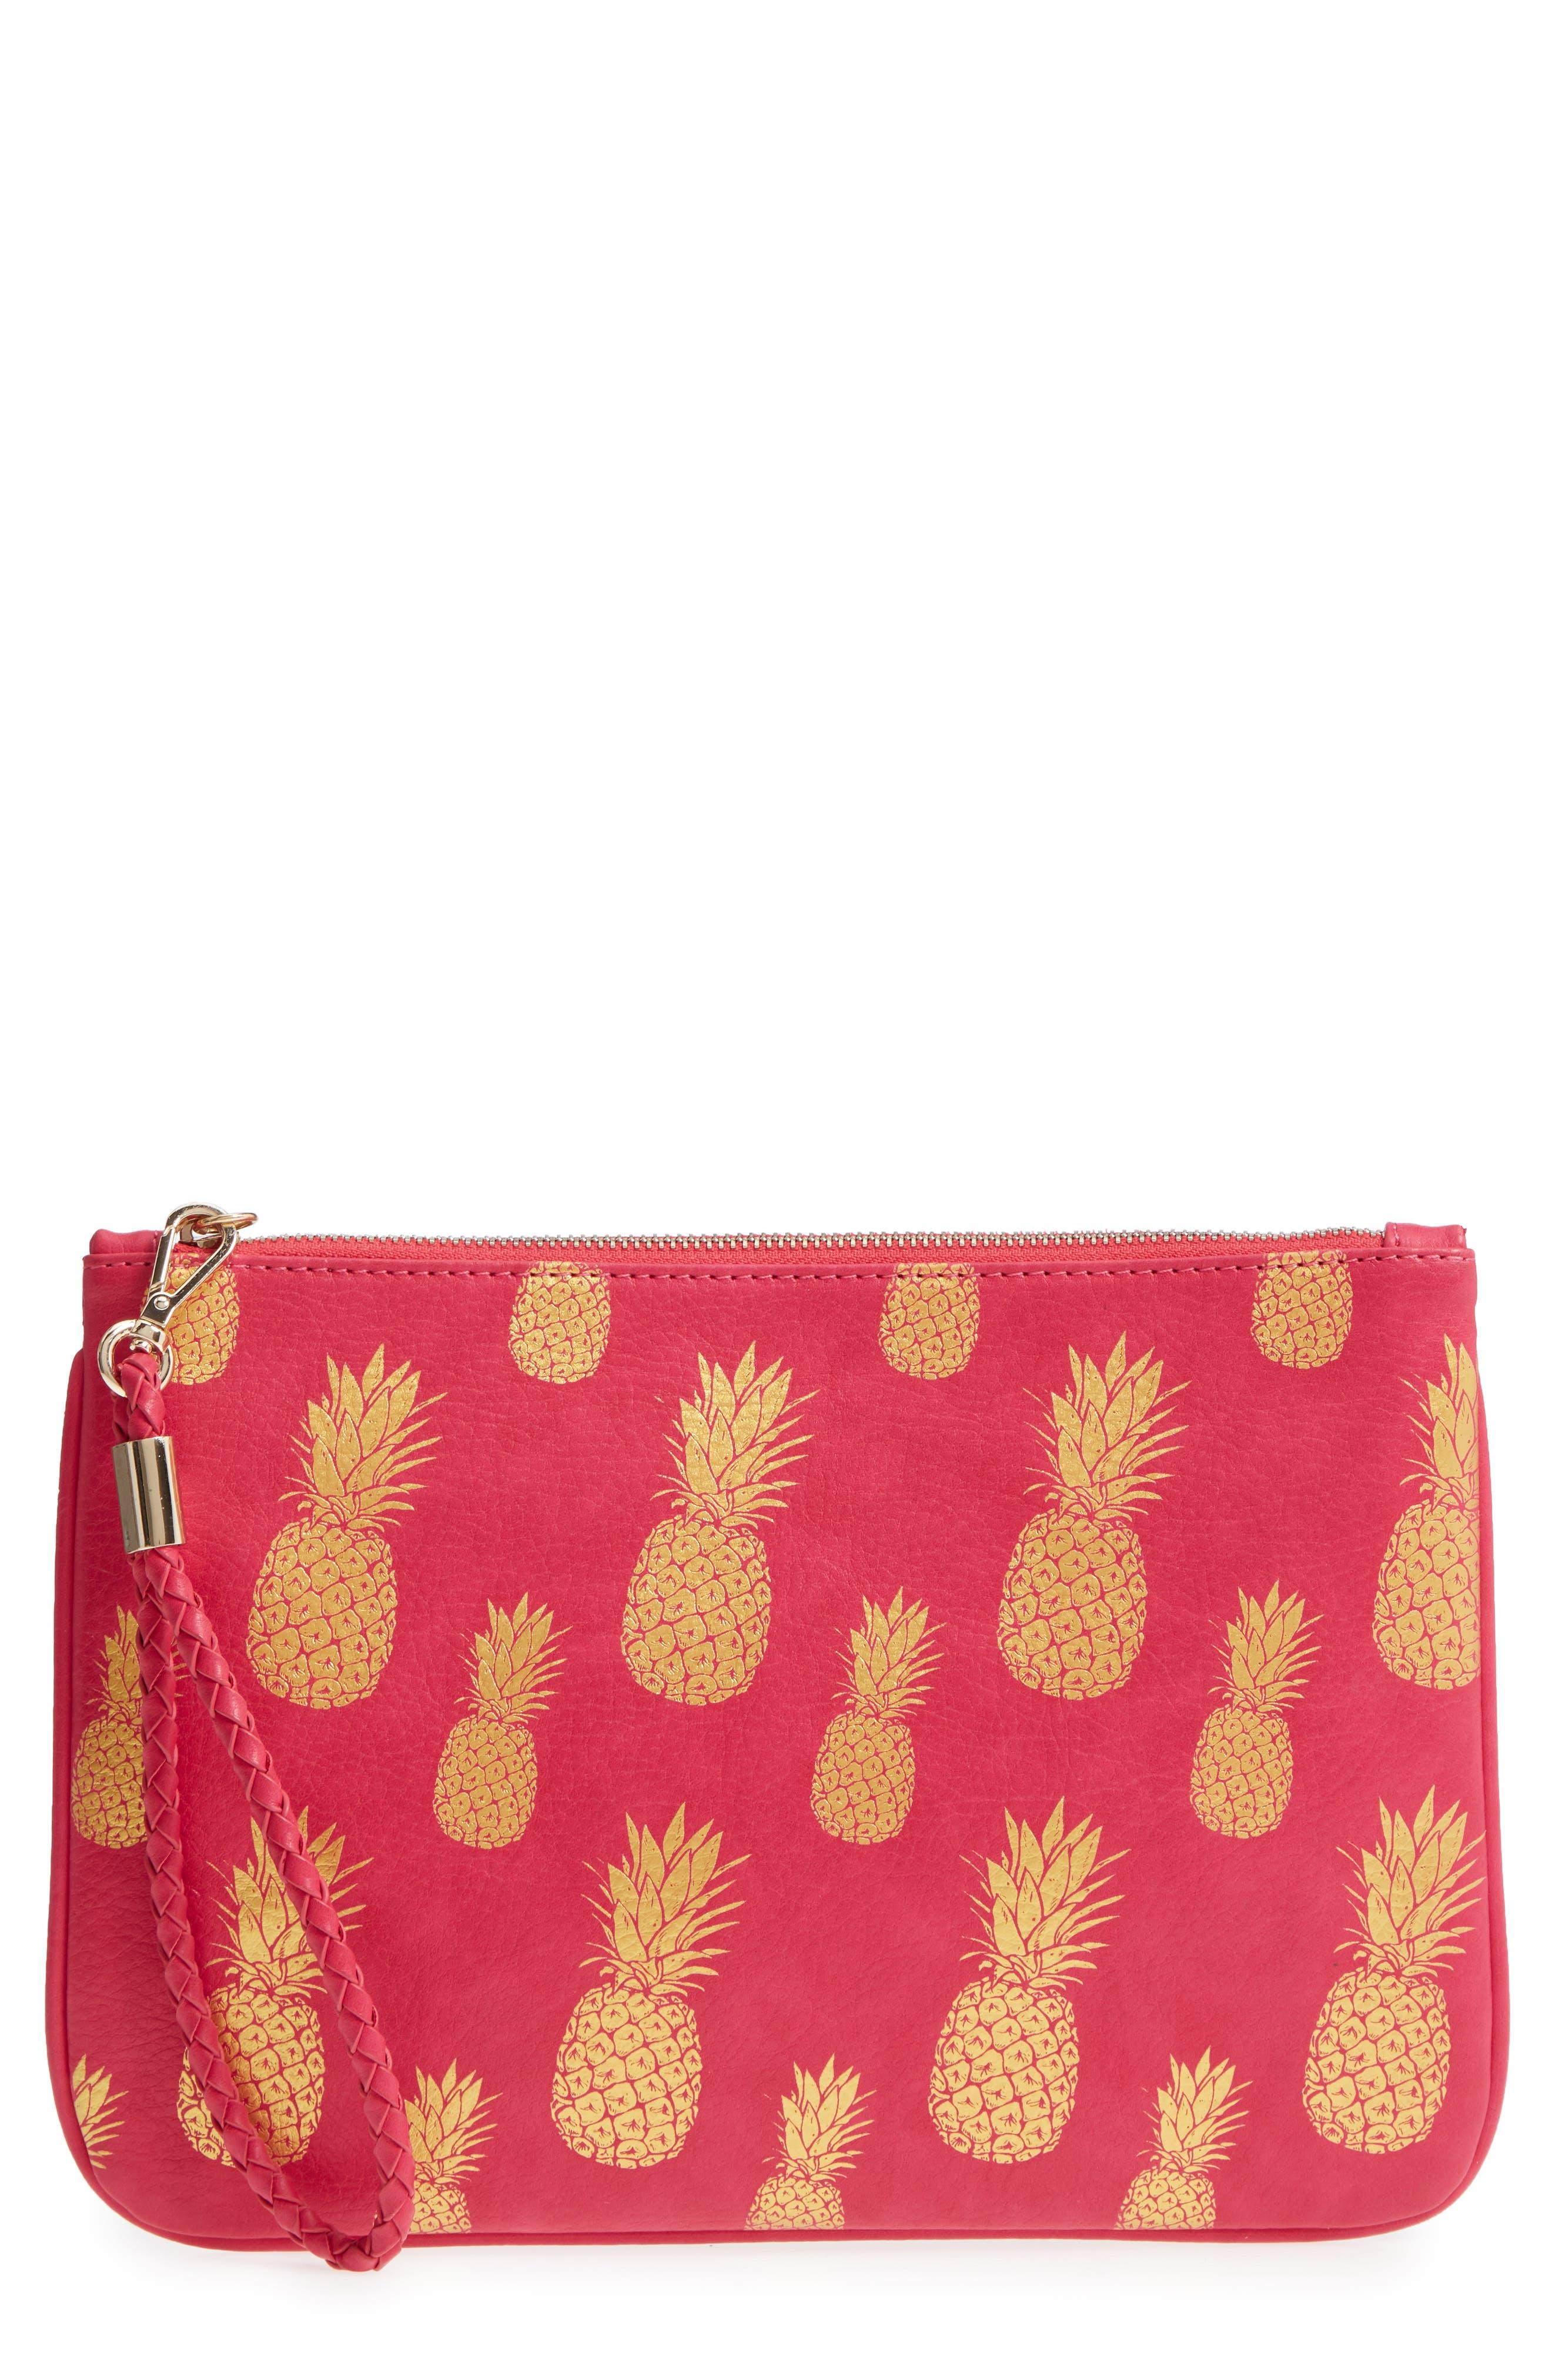 Mali + Lili Alice Pineapple Print Vegan Leather Clutch,                         Main,                         color, Hot Pink